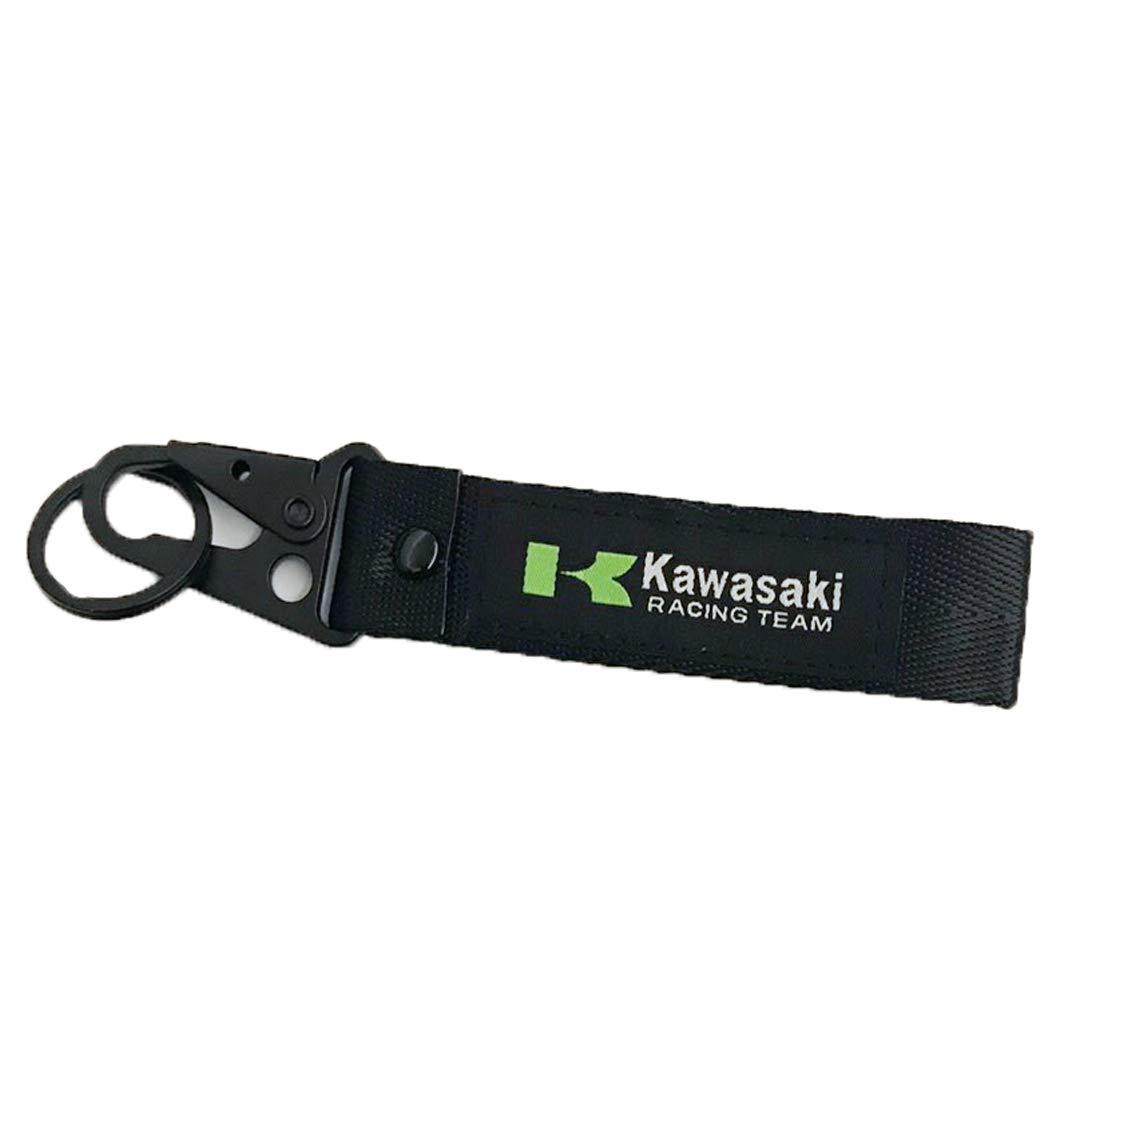 Ninja Black Racing Motor Woven Label Tag Key Chain for Automobile Car Motor Key Ring Accessory Karabiner Shackle Kawasaki